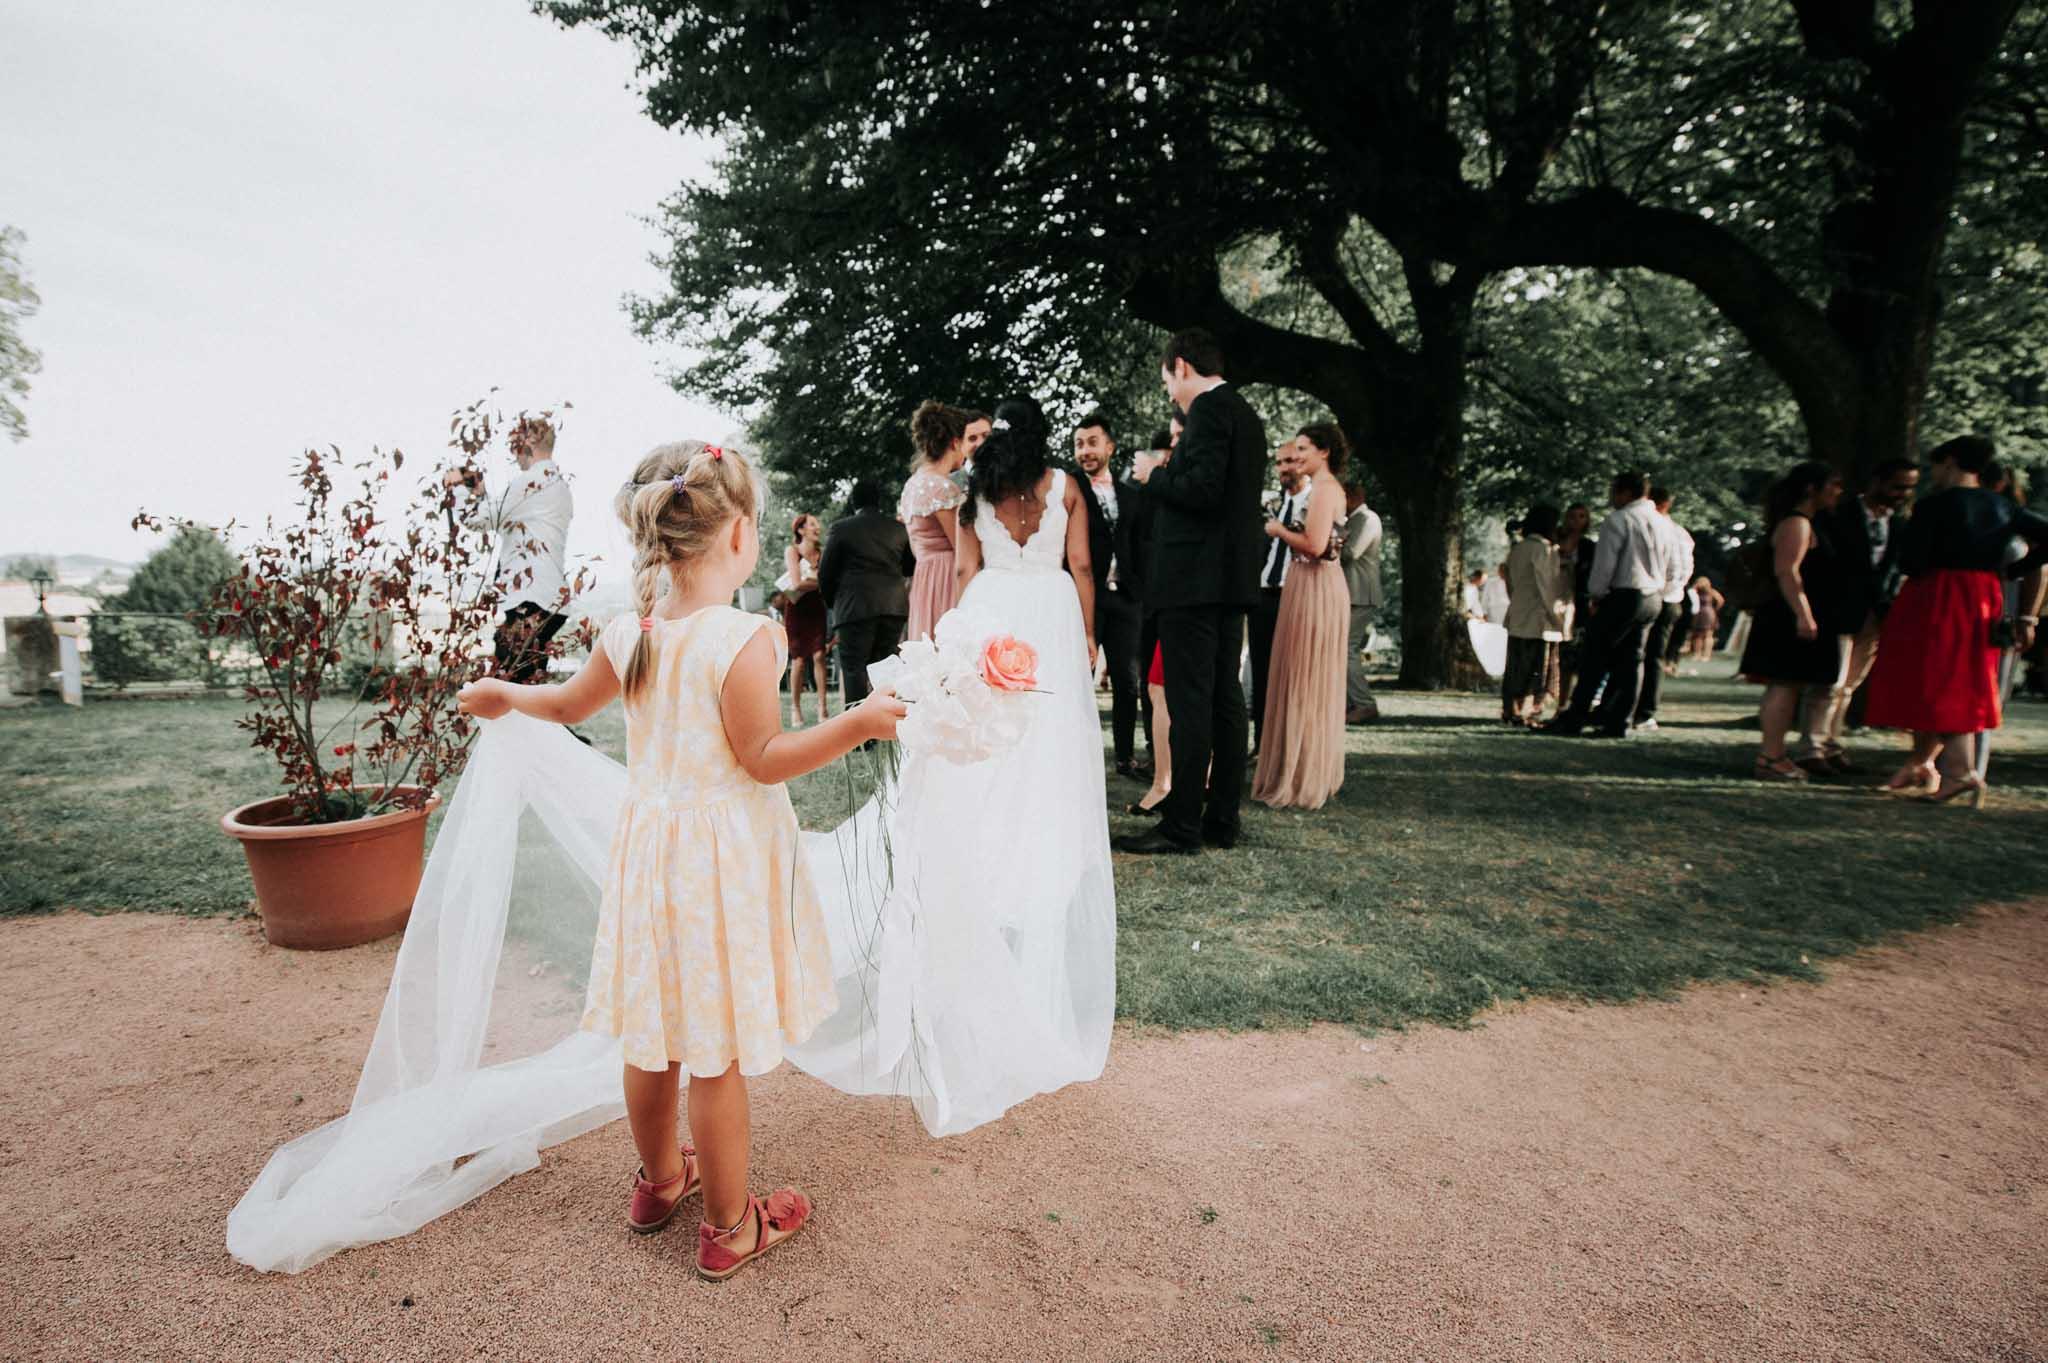 2017-07-15 - DSC_8628 - photographe - mariage - www.lauriediazwedding.com.jpg